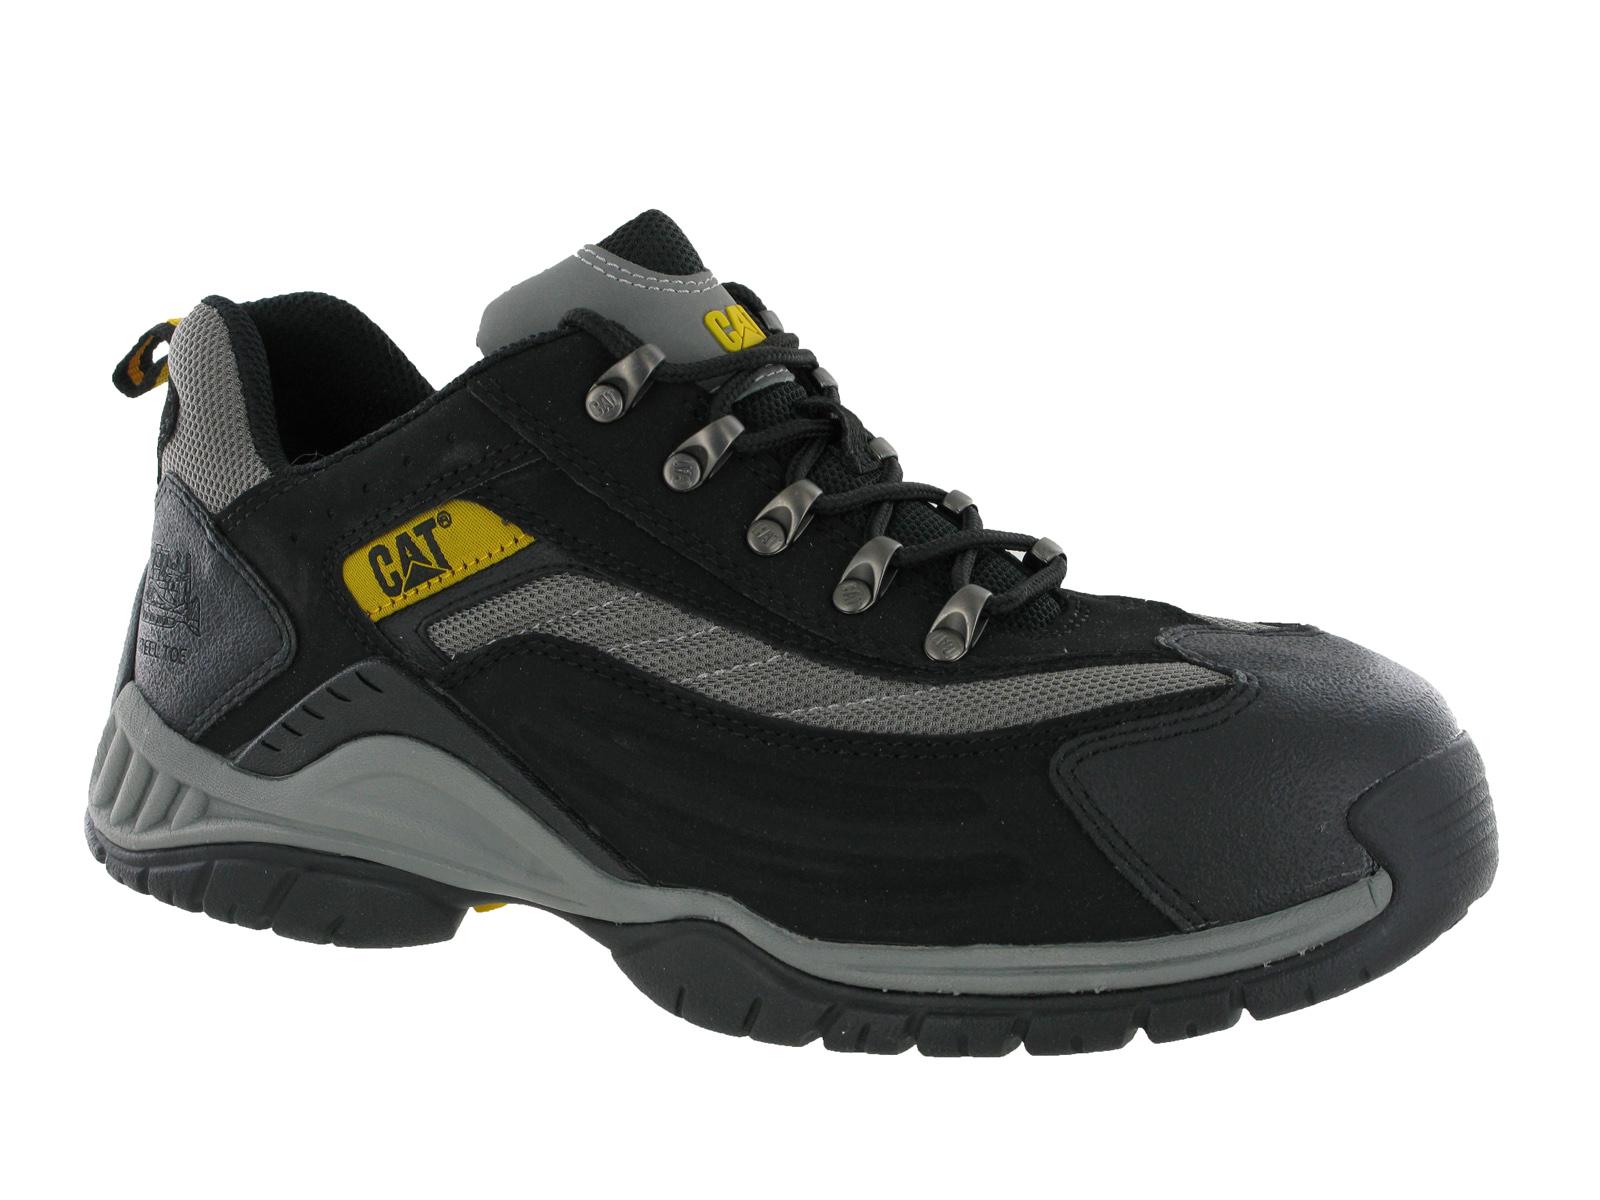 New Mens Caterpillar Moor Black Steel Toe Cap Safety Shoes ...